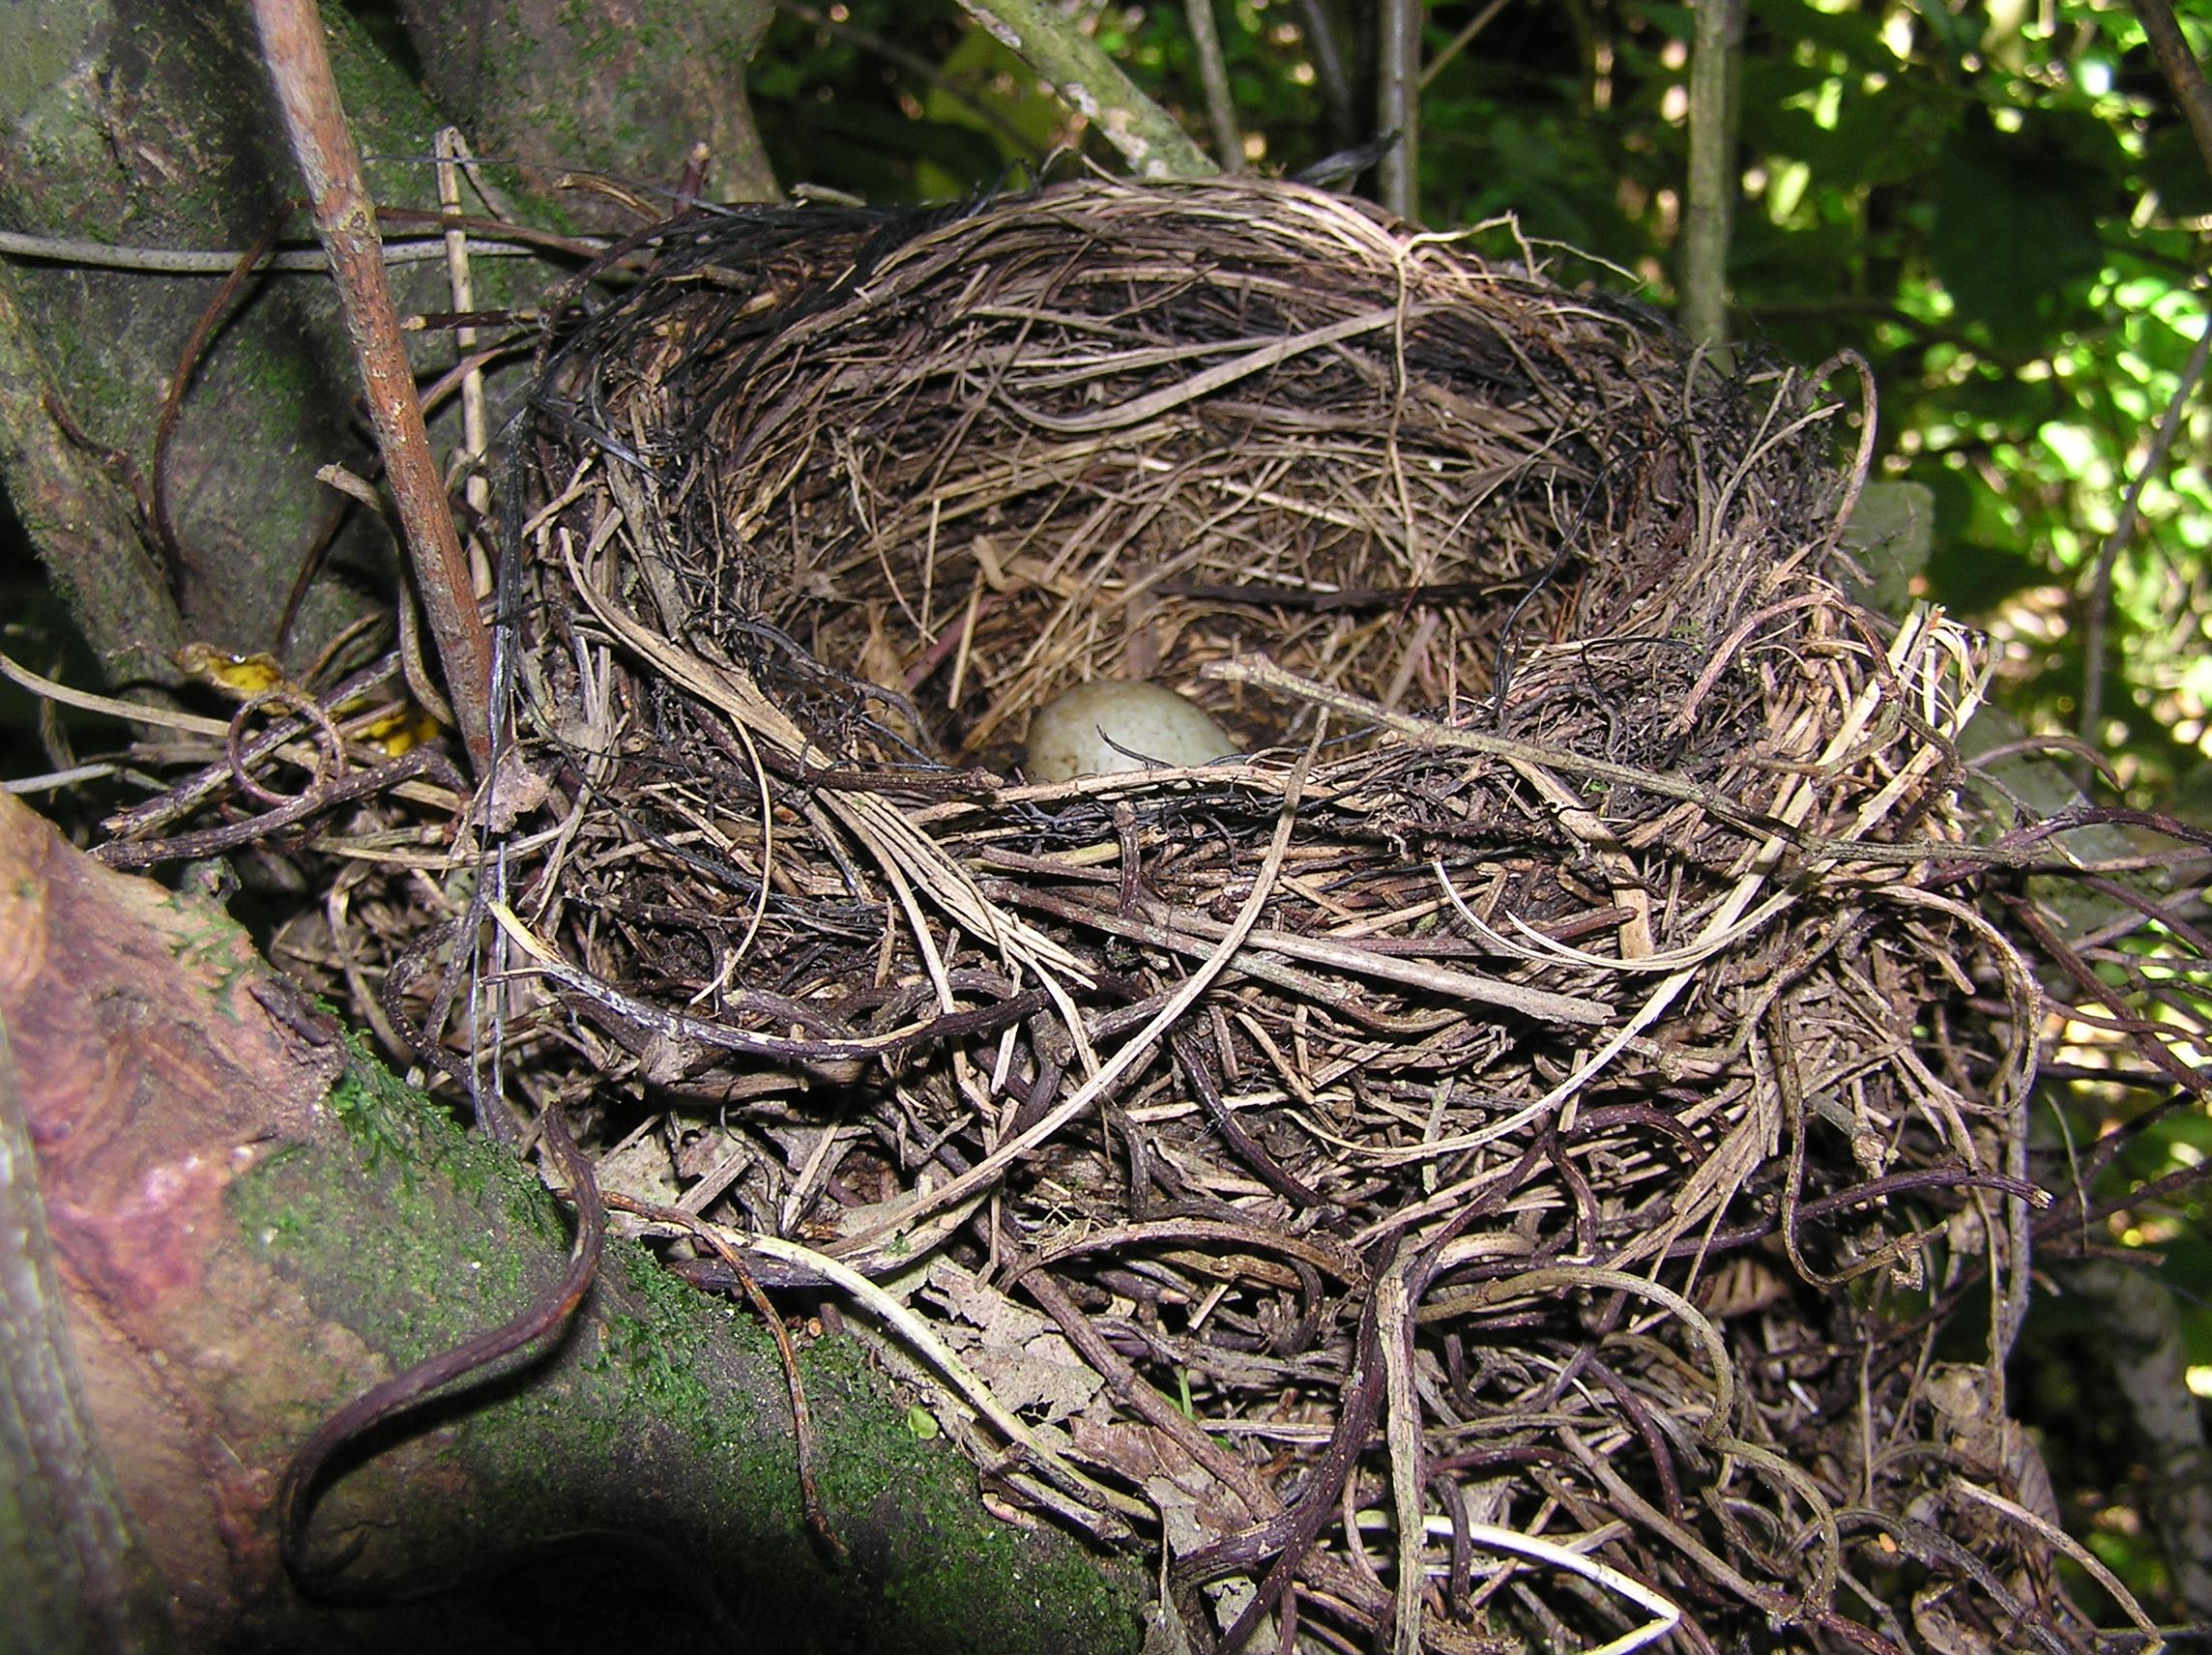 Nest Way To Treat Fleas On Cats